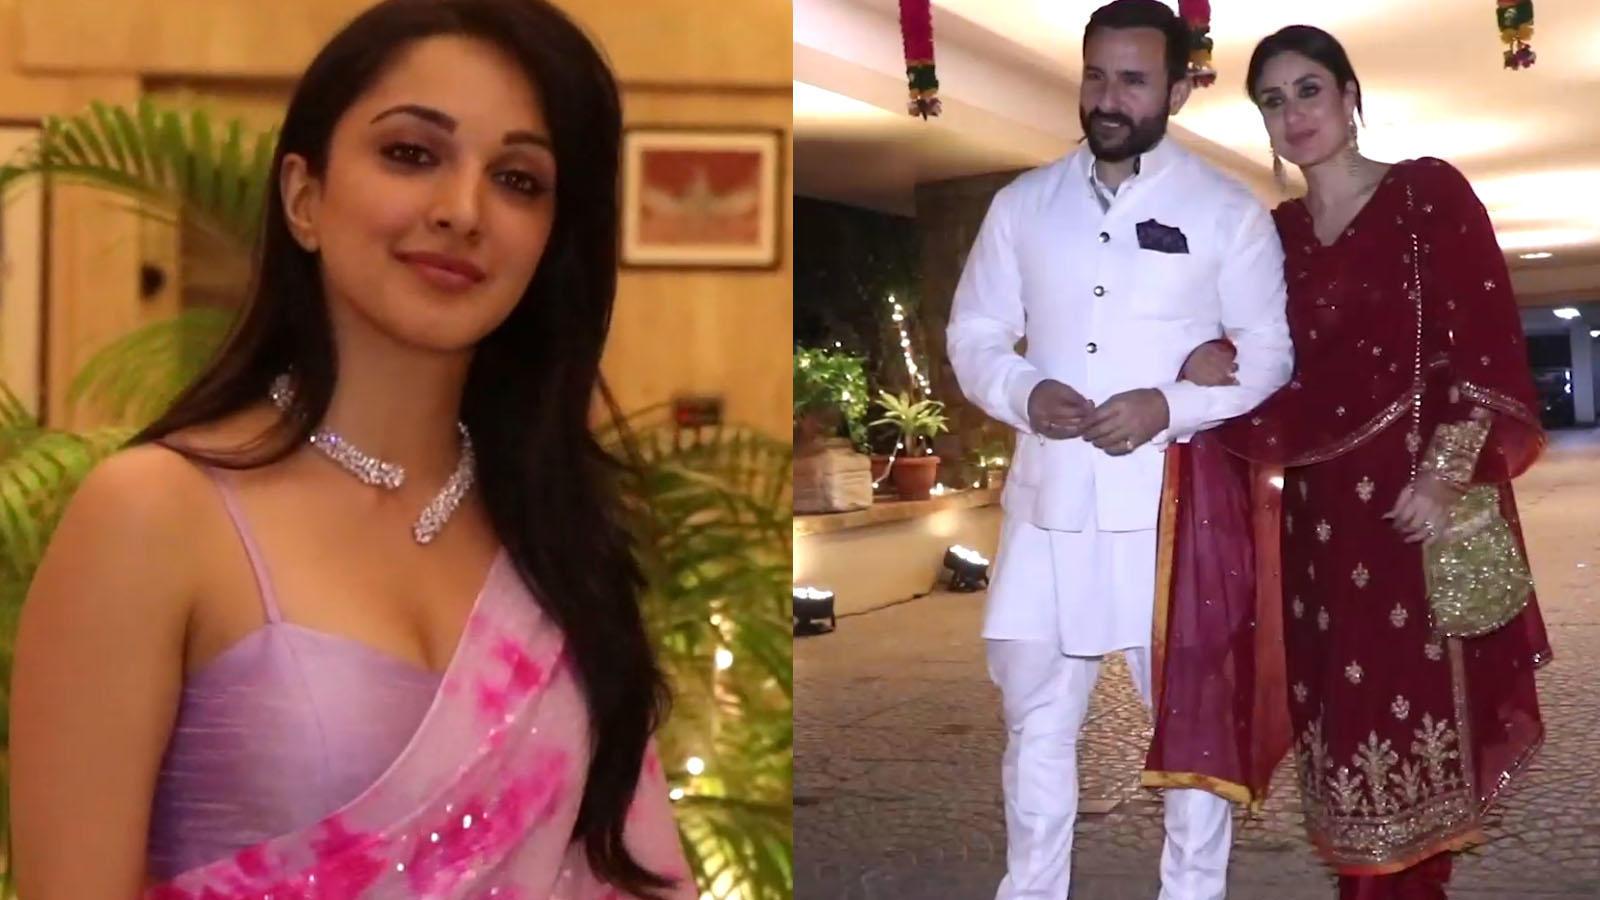 Kareena Kapoor-Saif Ali Khan, Kiara Advani and other Bollywood celebs dazzle at Armaan Jain's roka ceremony